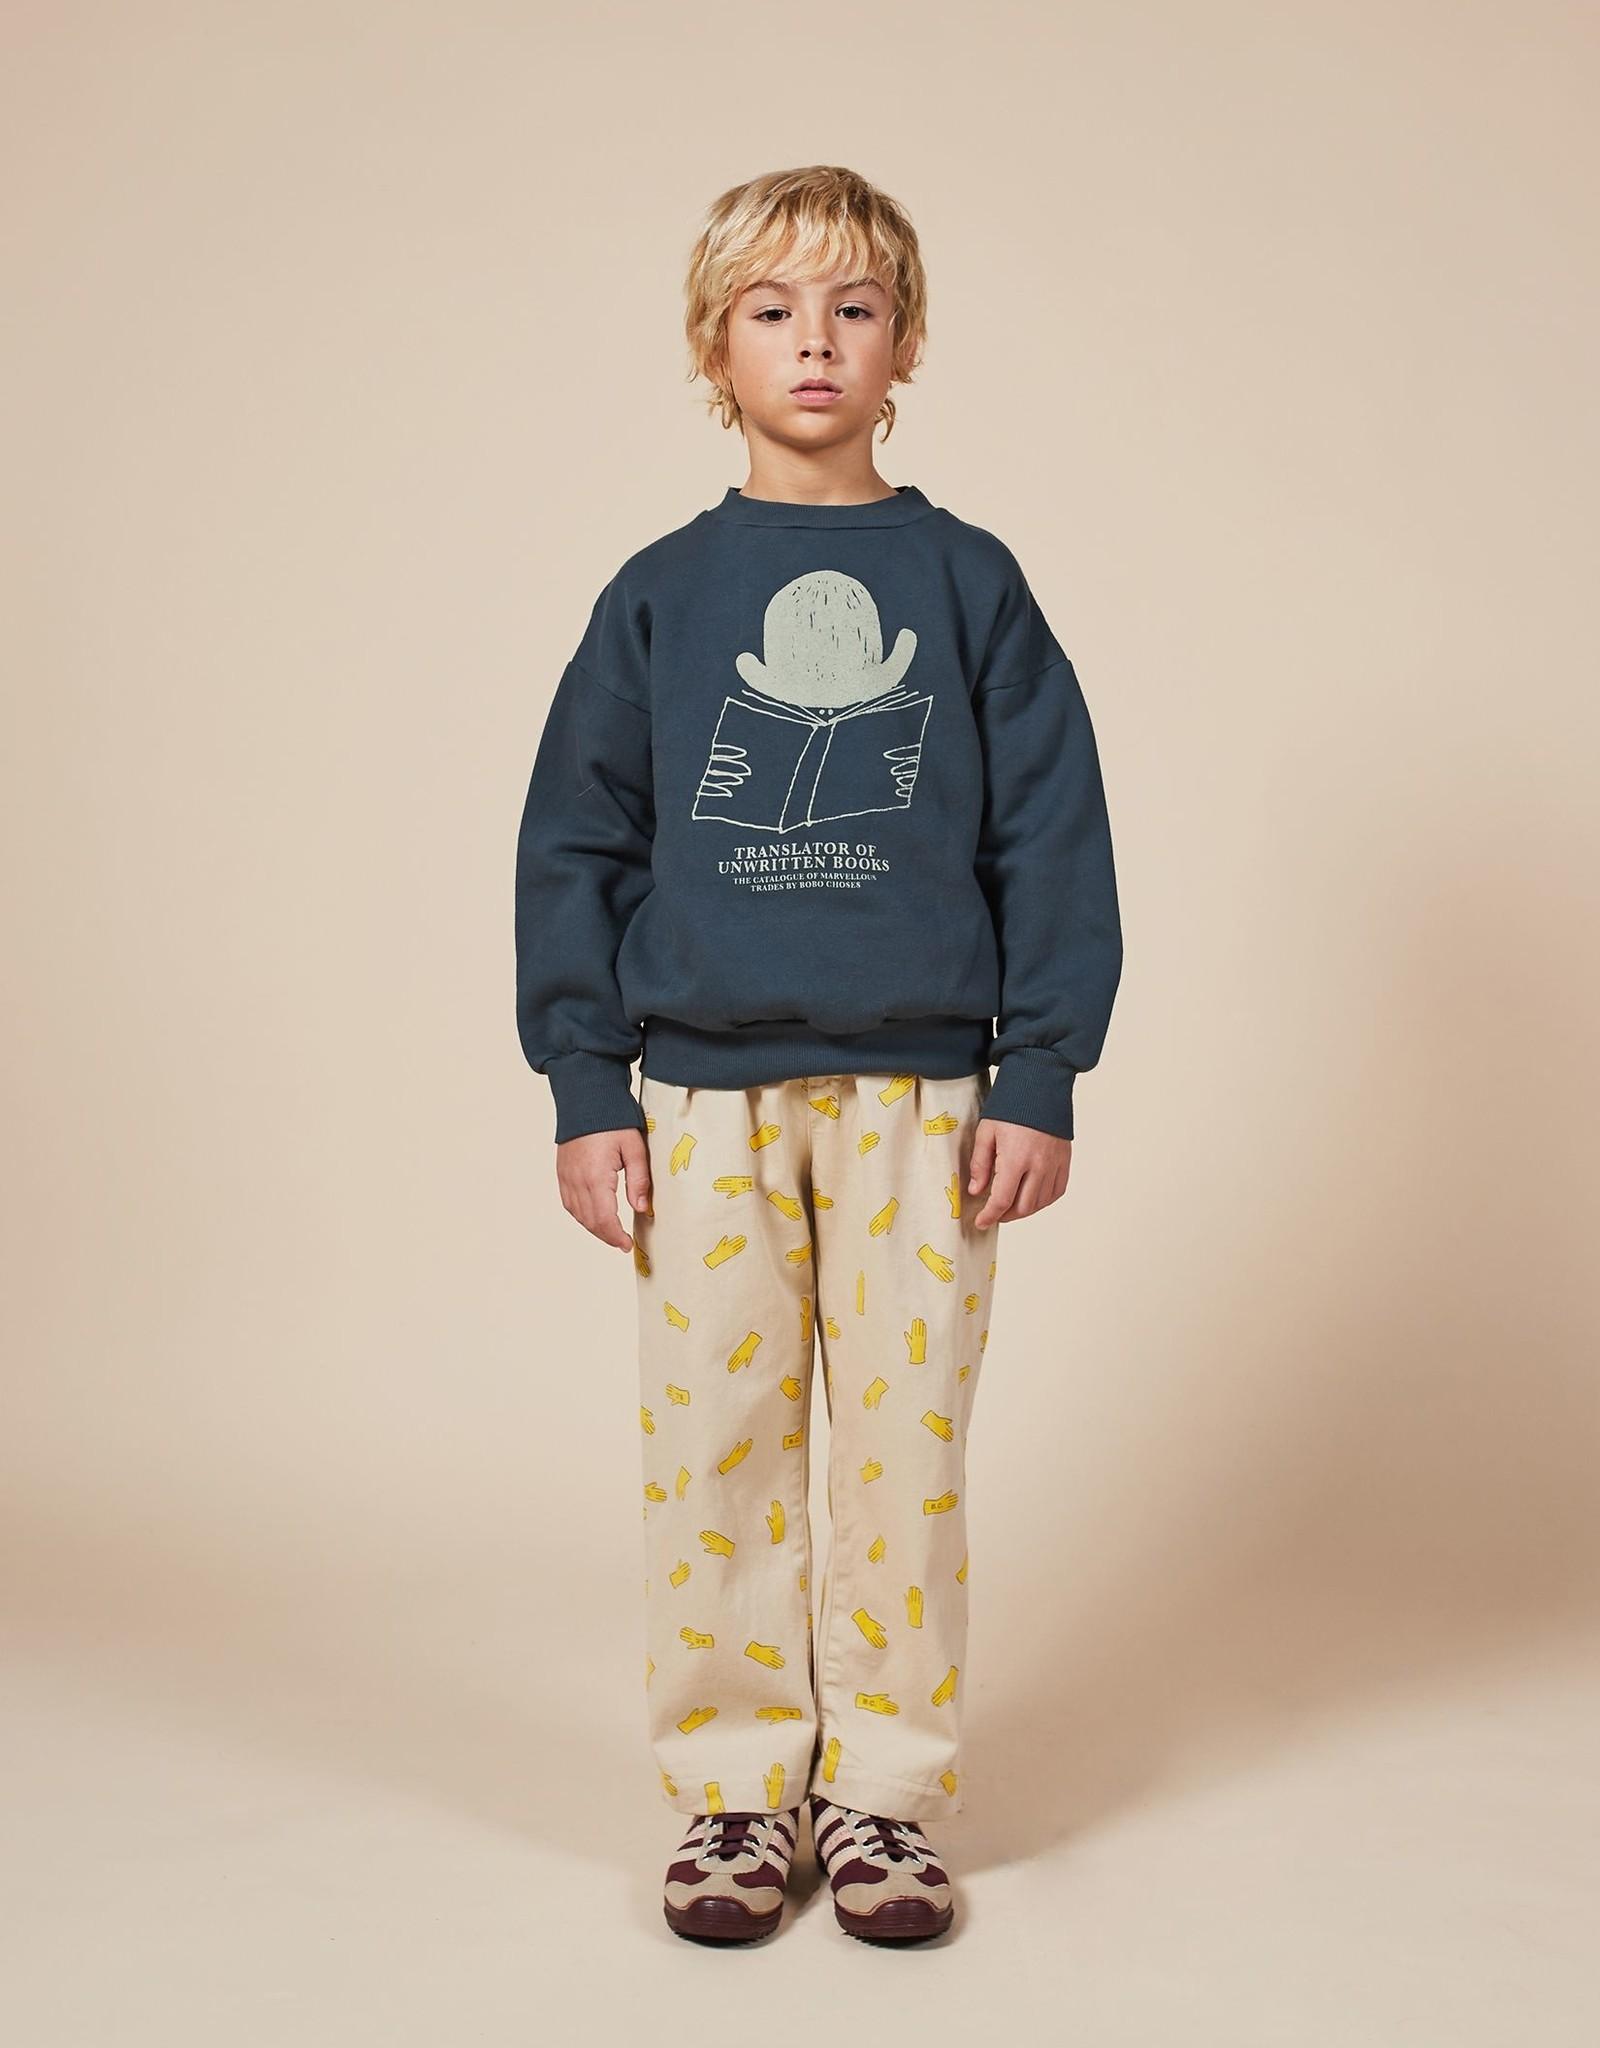 Bobo Choses - Translator Sweatshirt